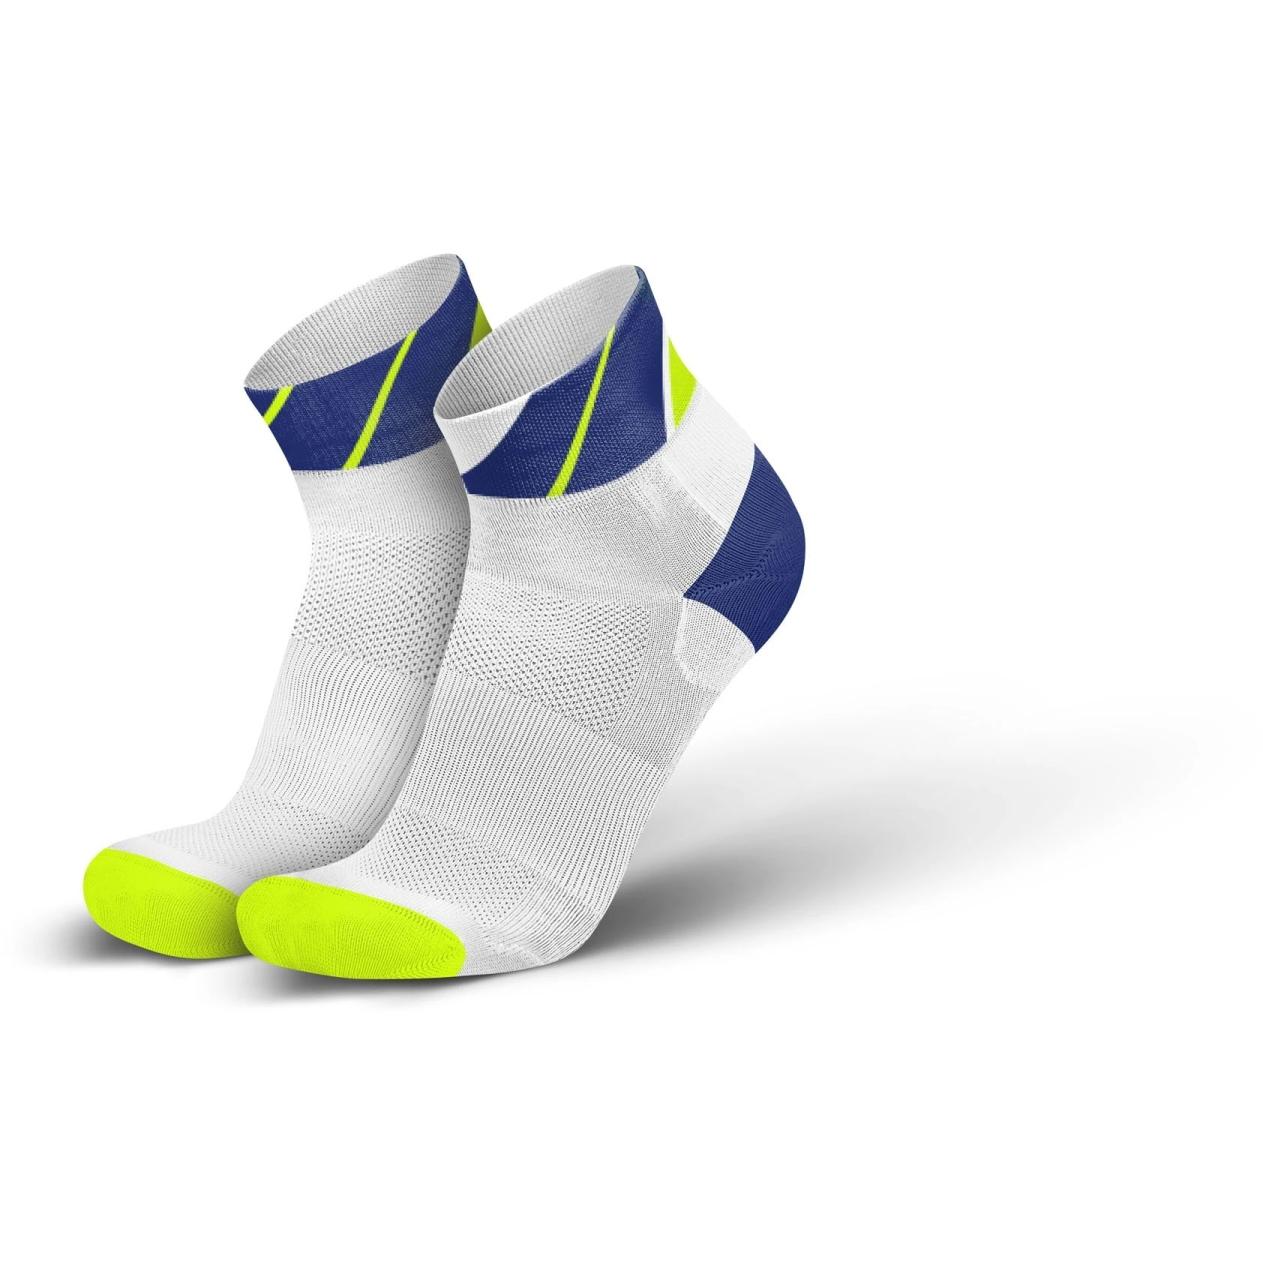 Produktbild von INCYLENCE Ultralight Slope Socken - Purple Canary